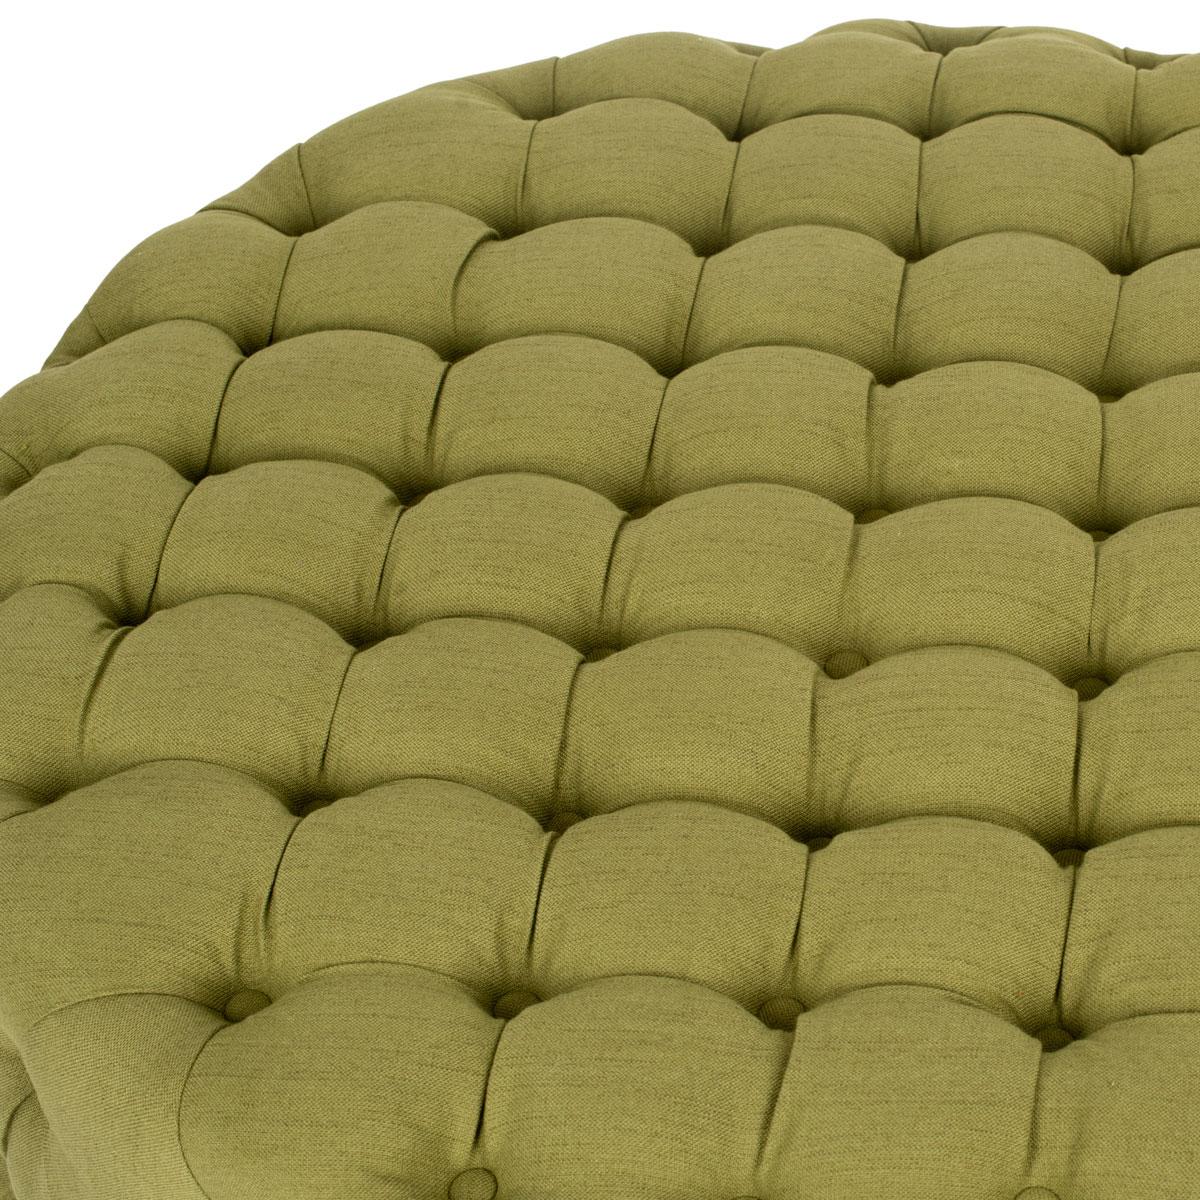 Amazing Mcr4638D Ottomans Furniture By Safavieh Bralicious Painted Fabric Chair Ideas Braliciousco